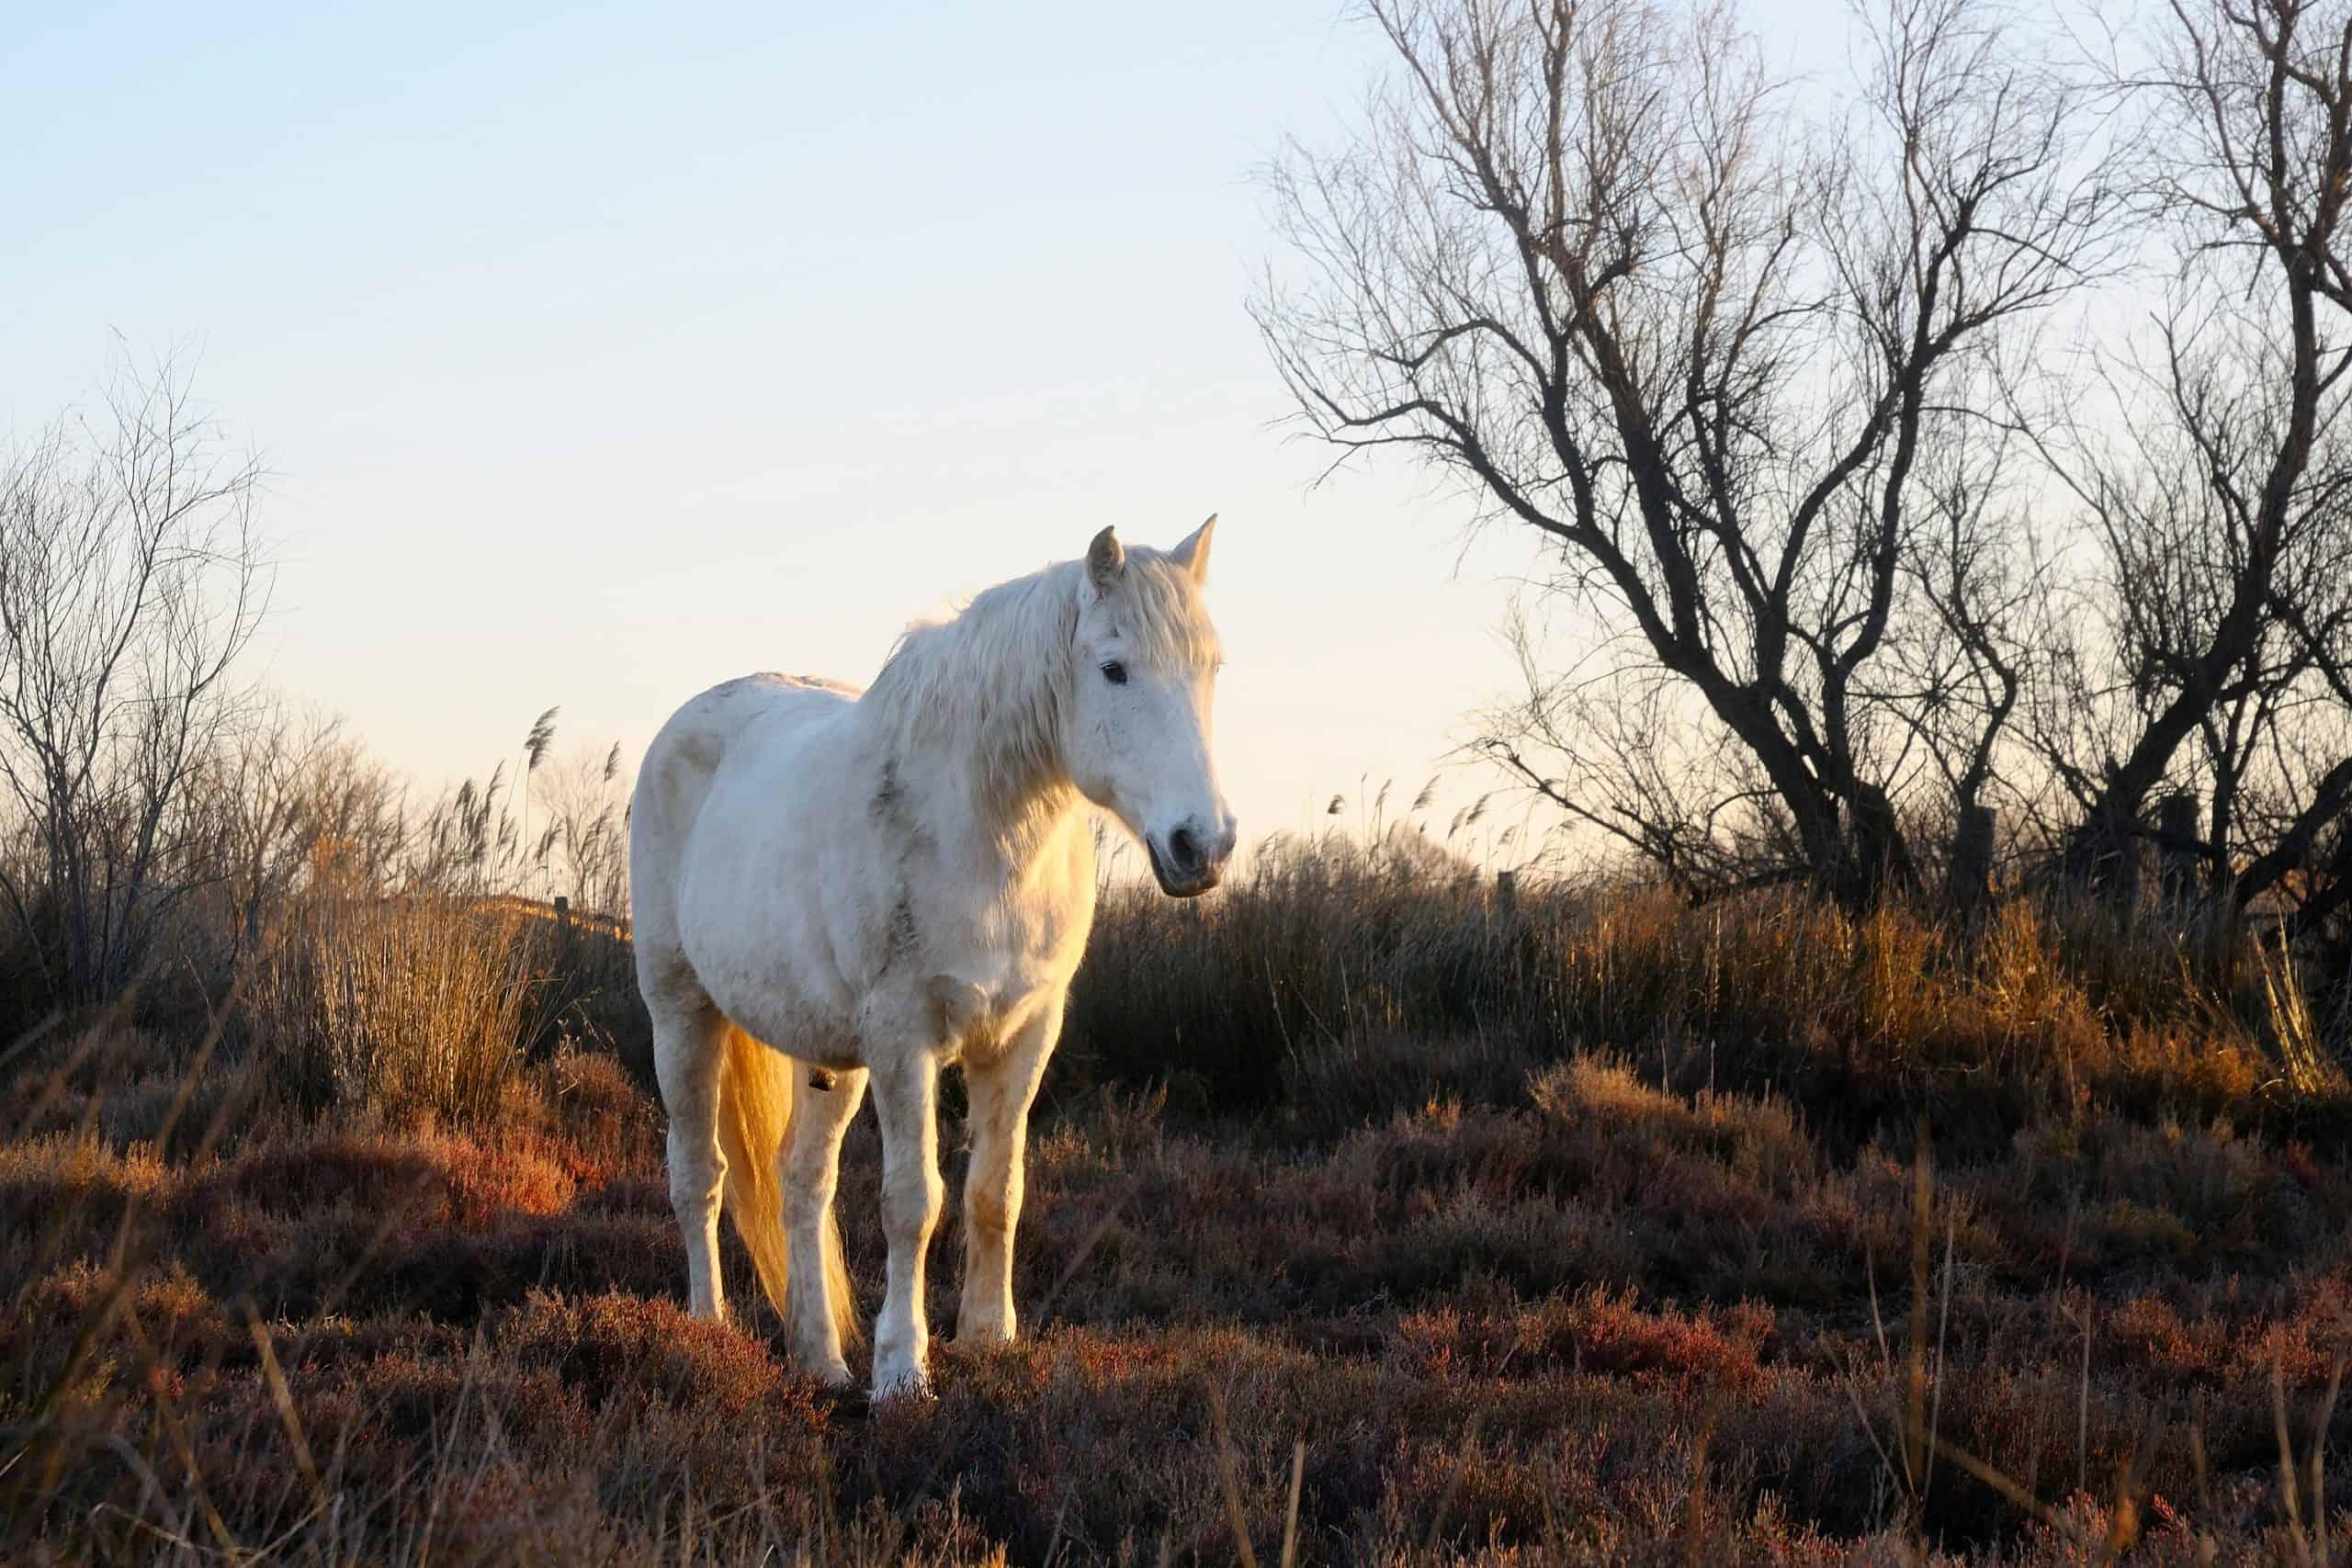 A white Camargue horse in a field.